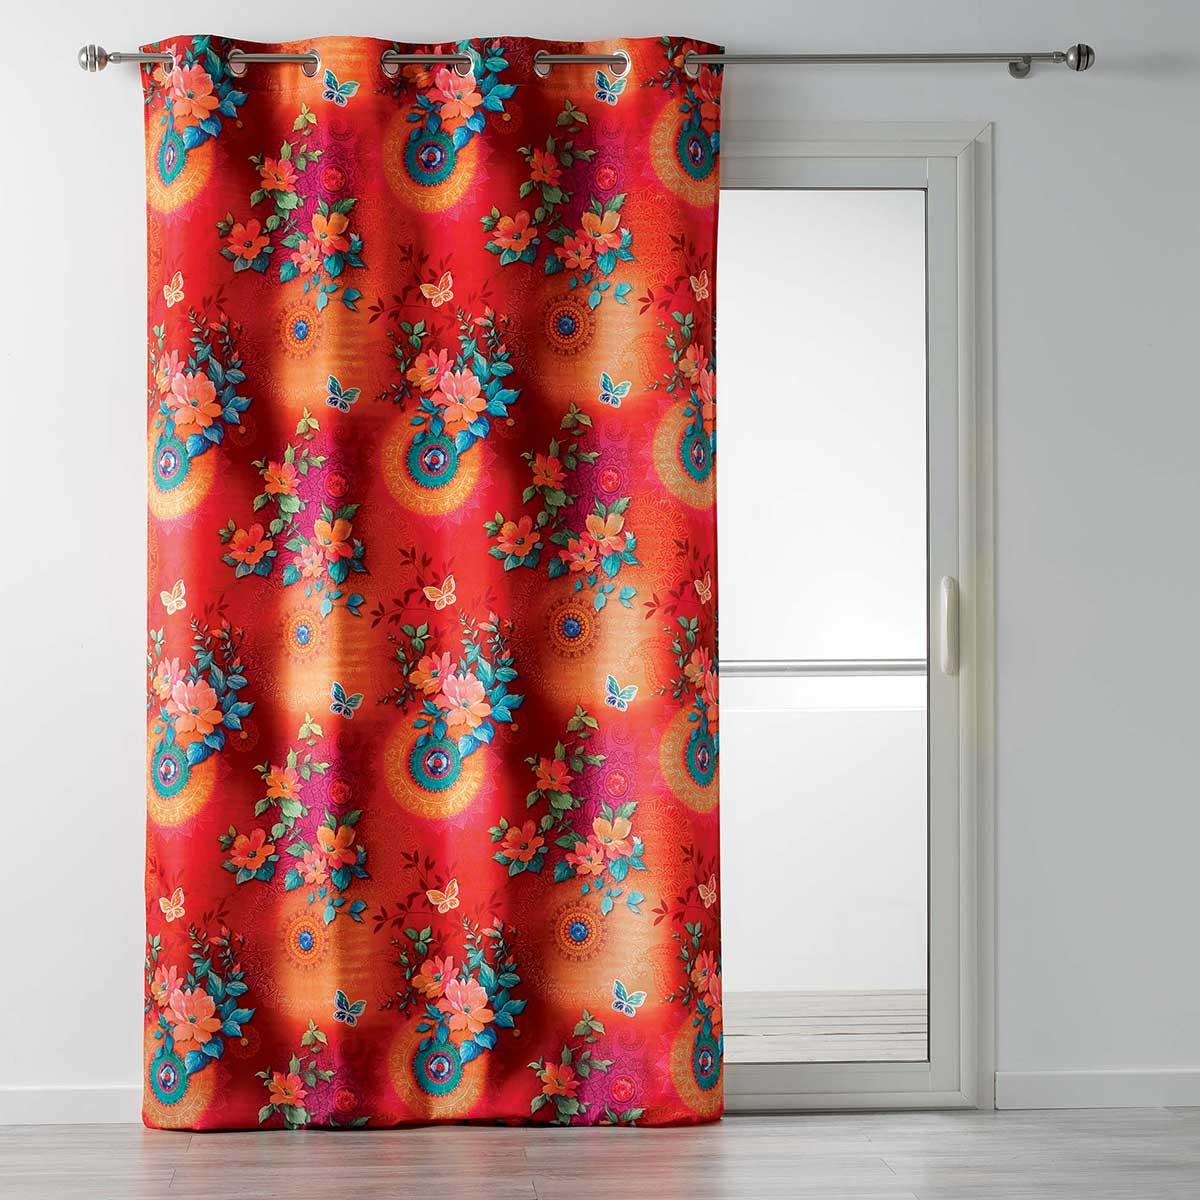 Rideau Tamisant Ambiance Japonisante - Multicolore - 140 x 260 cm